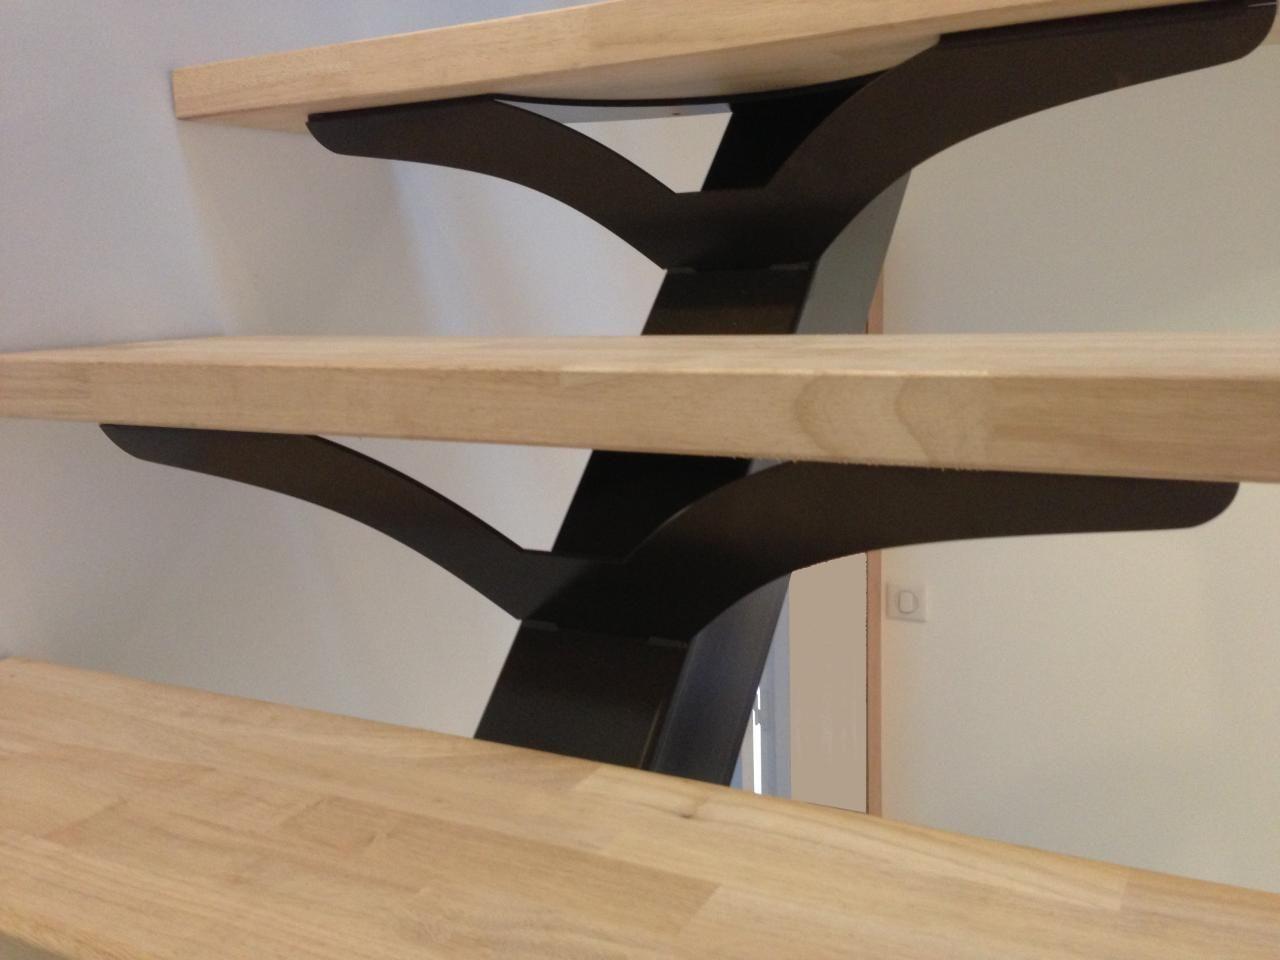 support marche escalier ab29 jornalagora. Black Bedroom Furniture Sets. Home Design Ideas